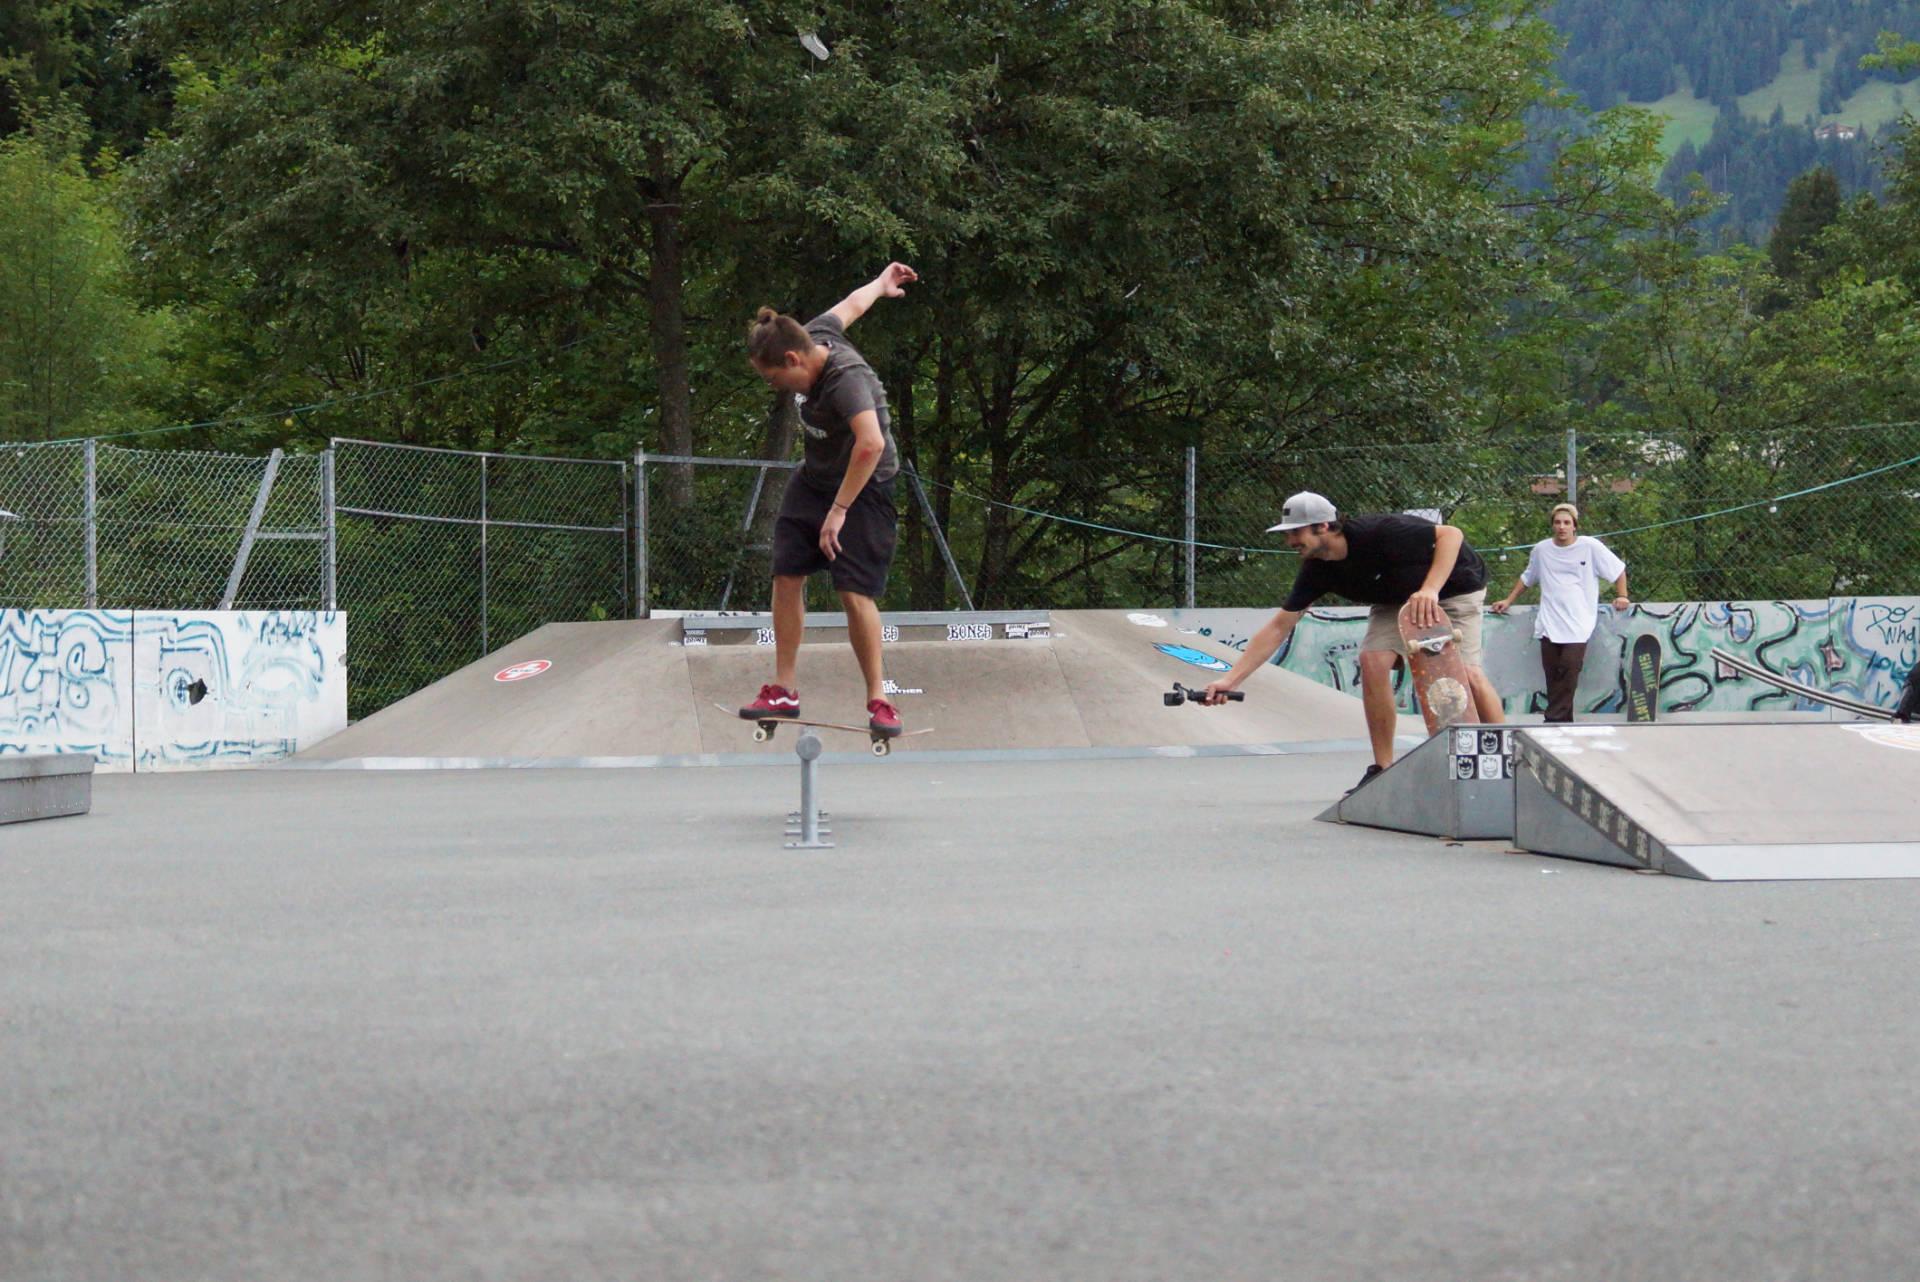 skateboardheadz fieberbrunn kgt 2019 finale 00010